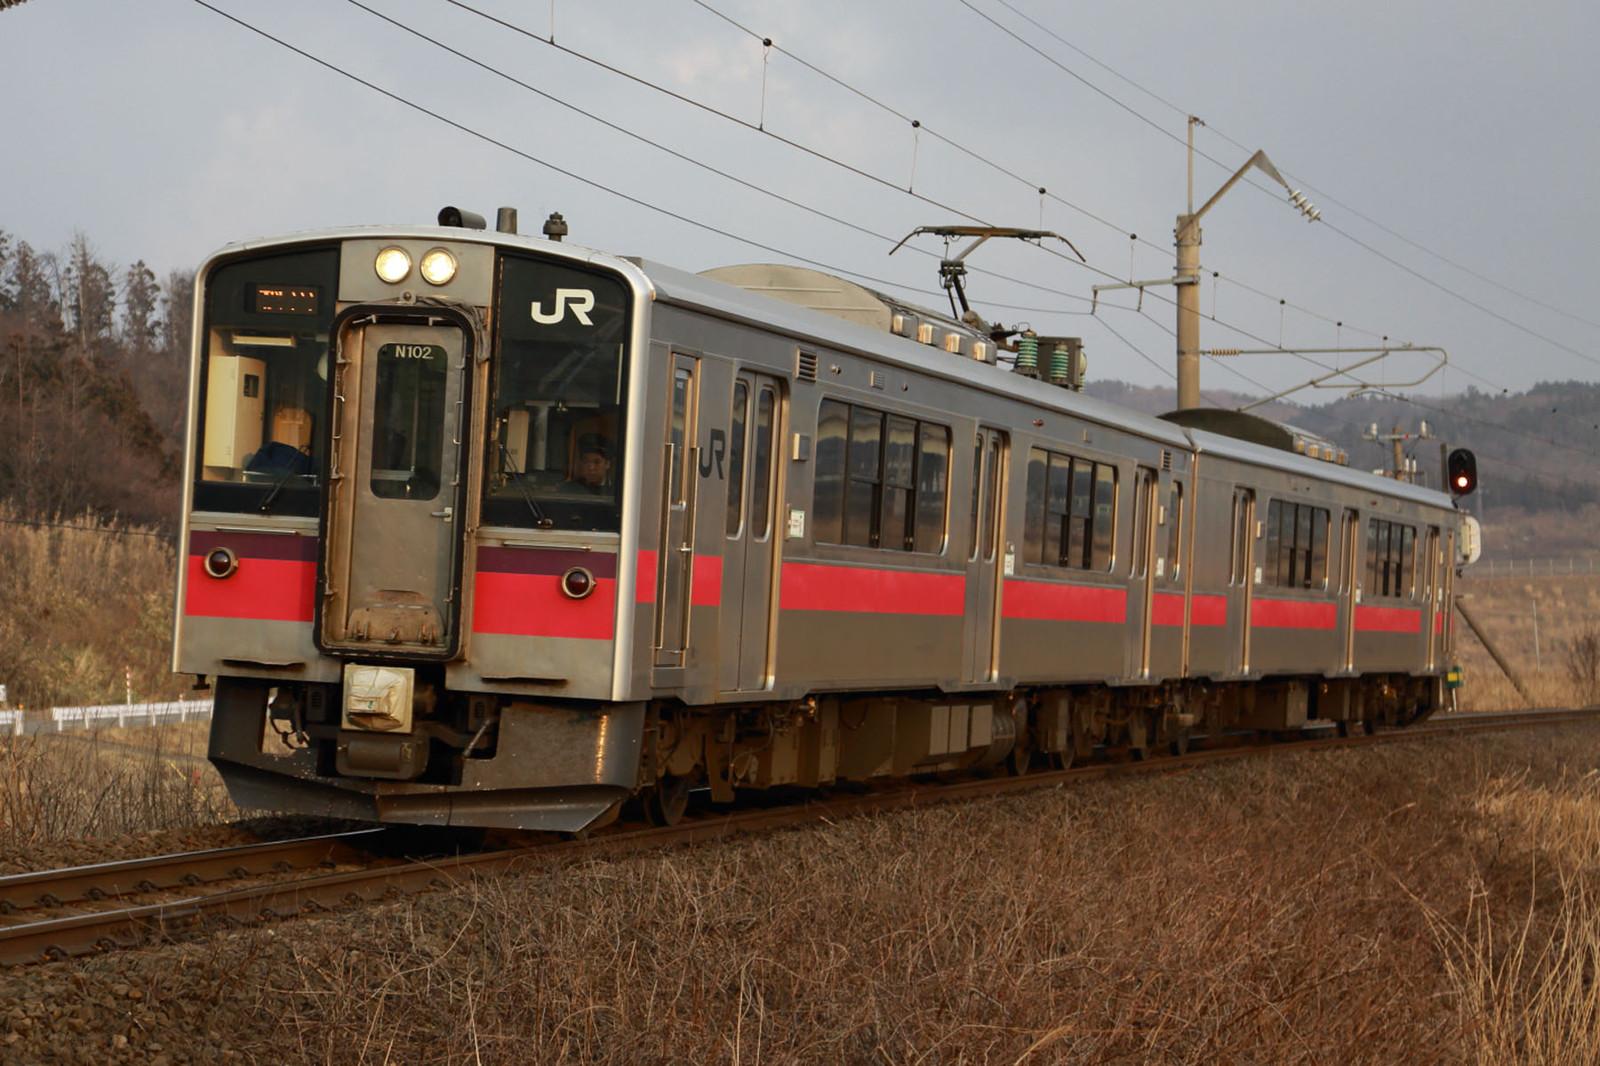 Img52258